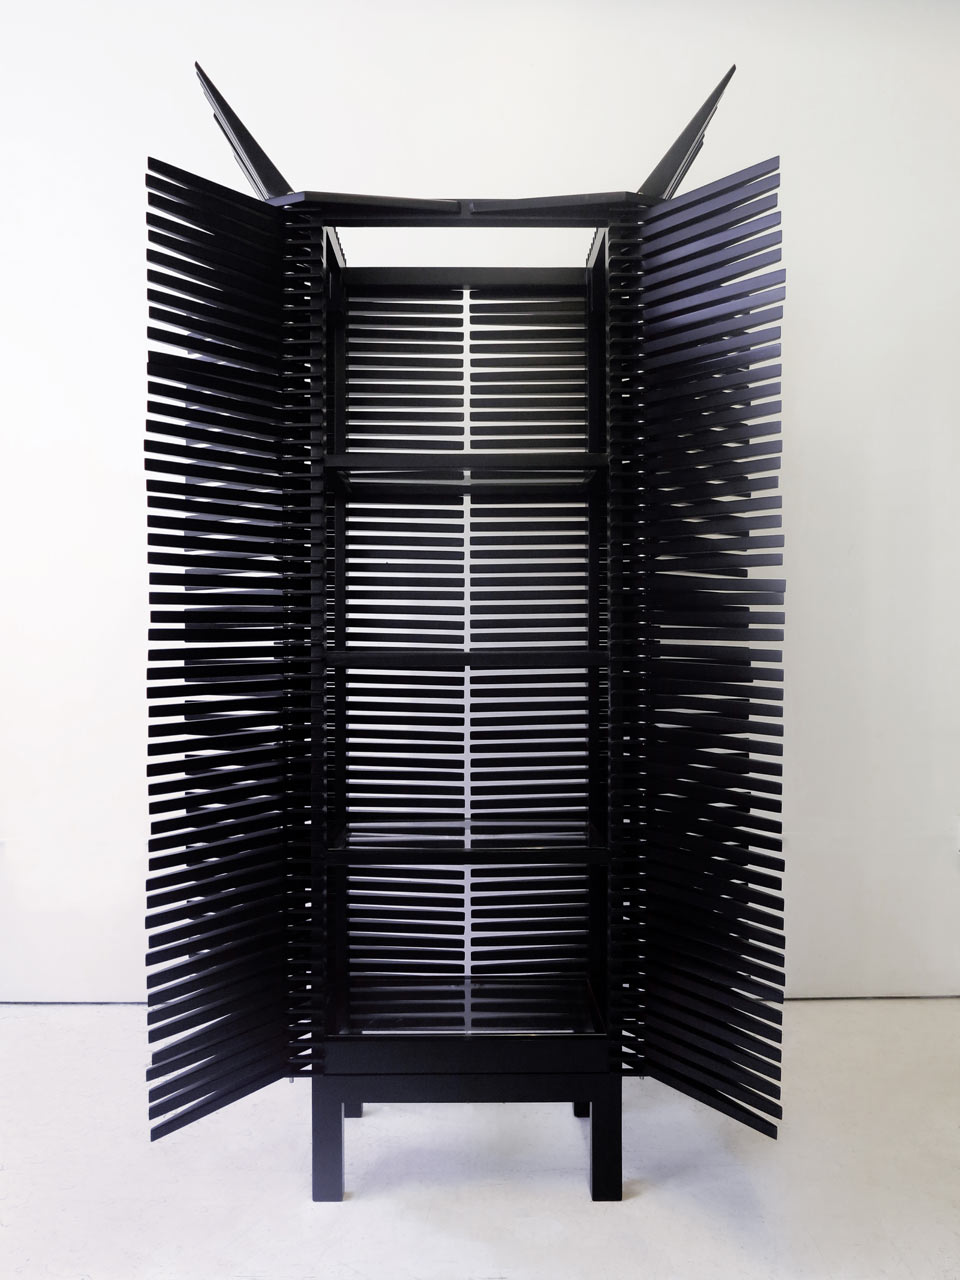 Samurai-Cabinet-Sebastian-Errazuriz-8